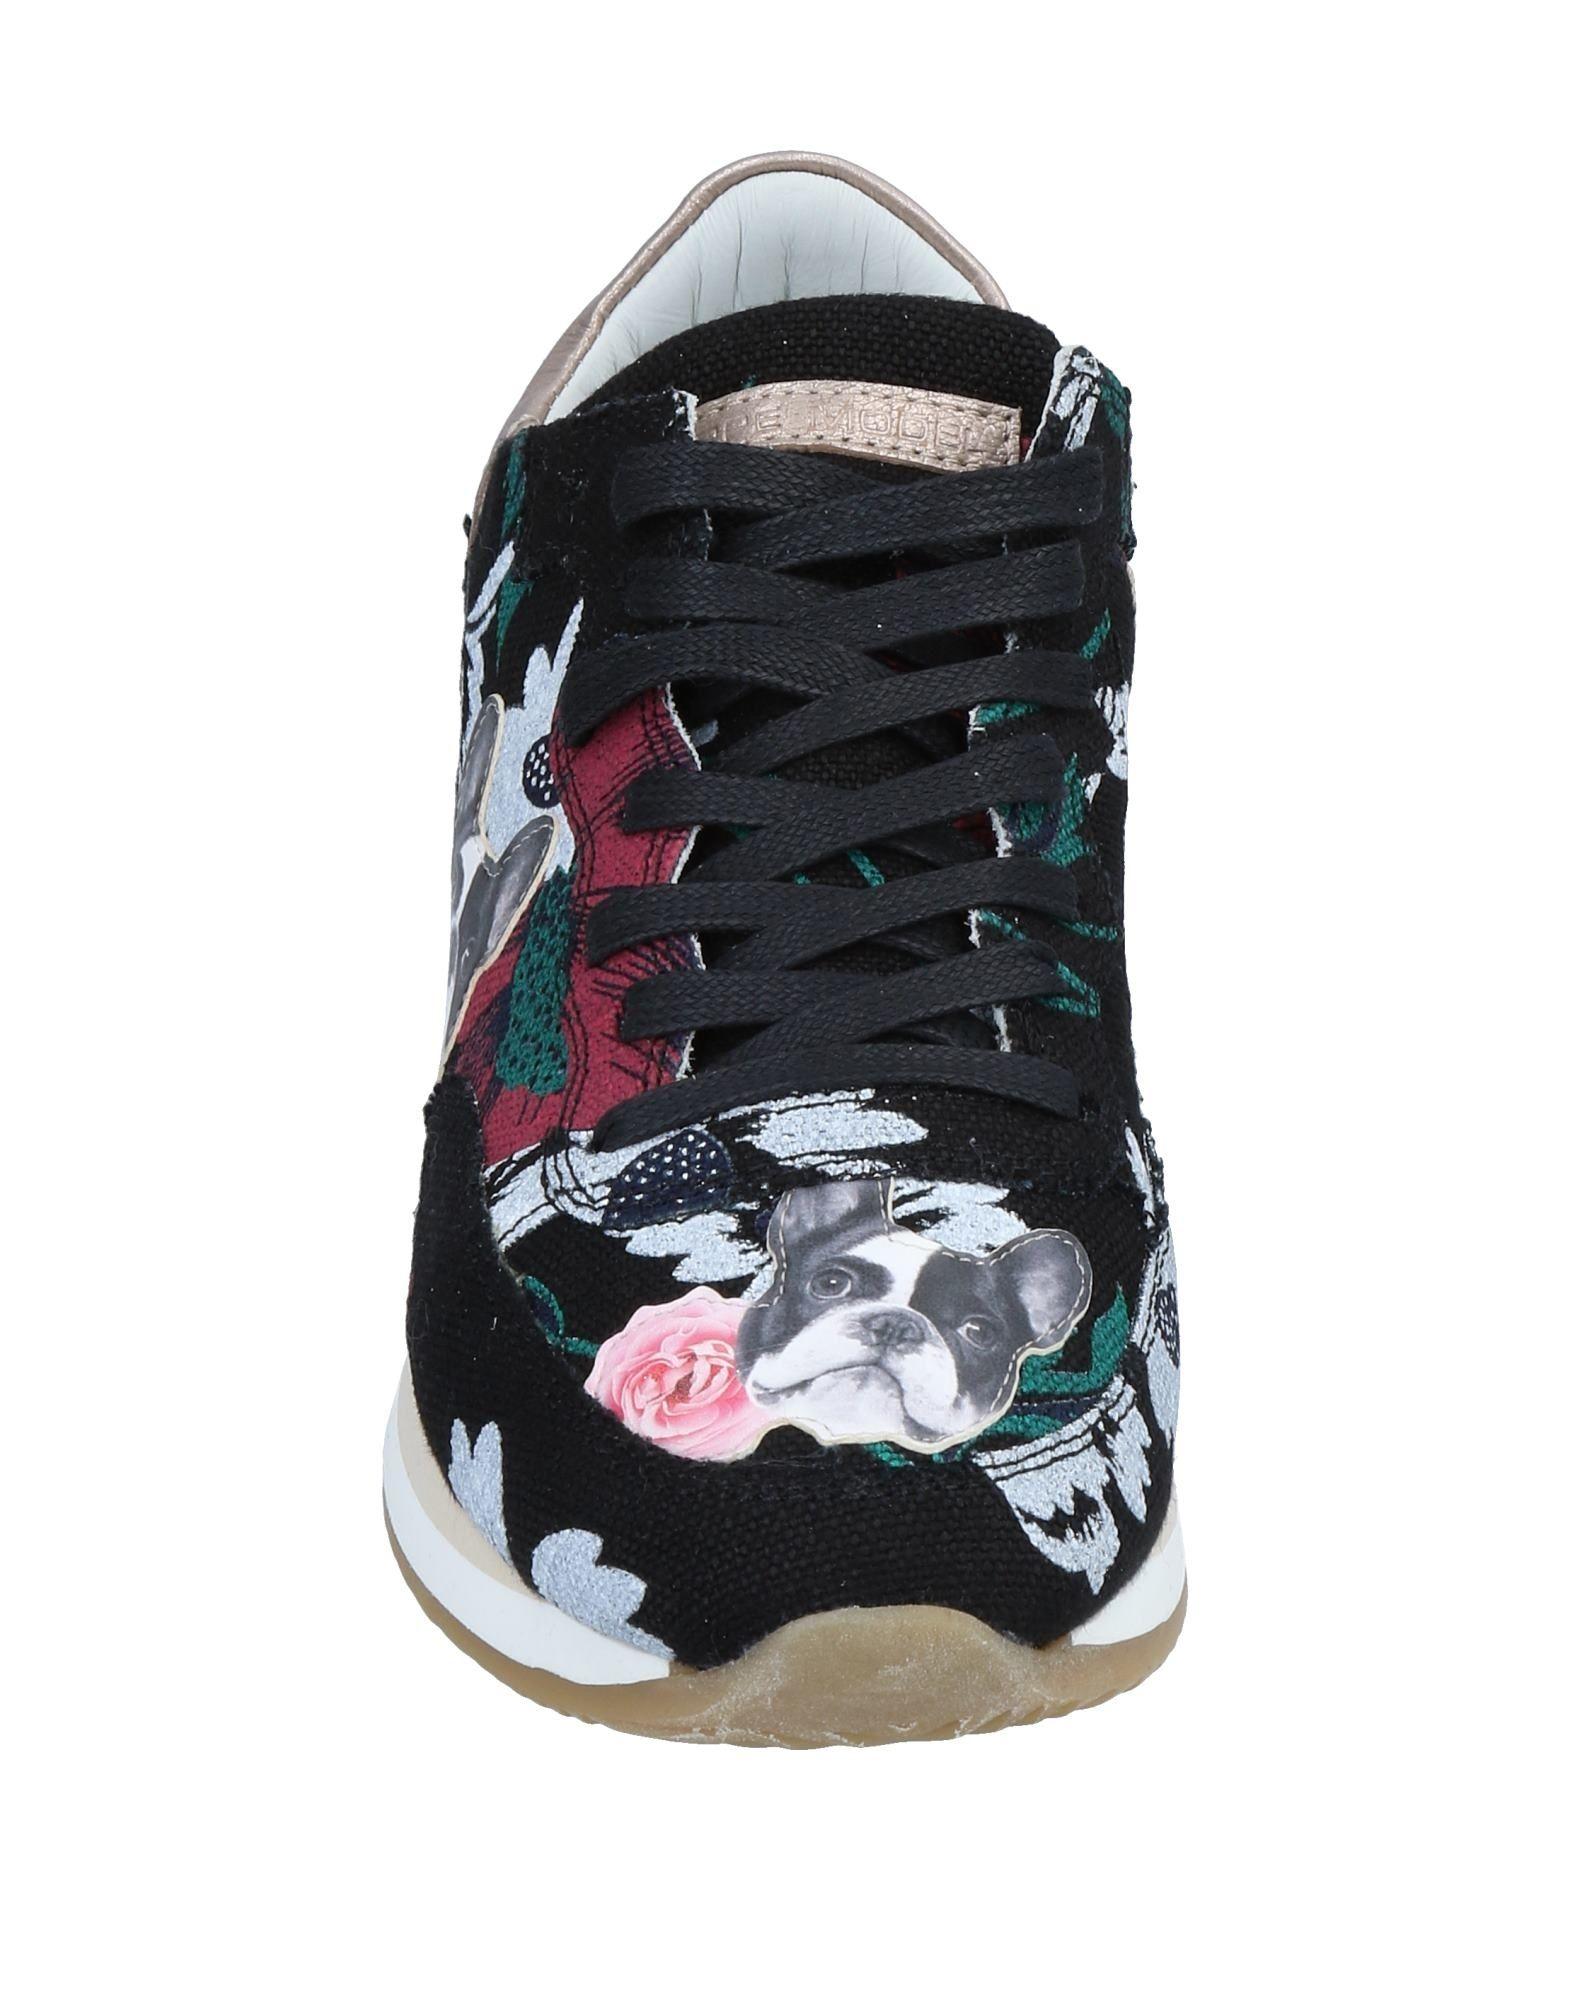 Philippe Model Sneakers Sneakers Sneakers - Women Philippe Model Sneakers online on  United Kingdom - 11568543OE b4d5dc